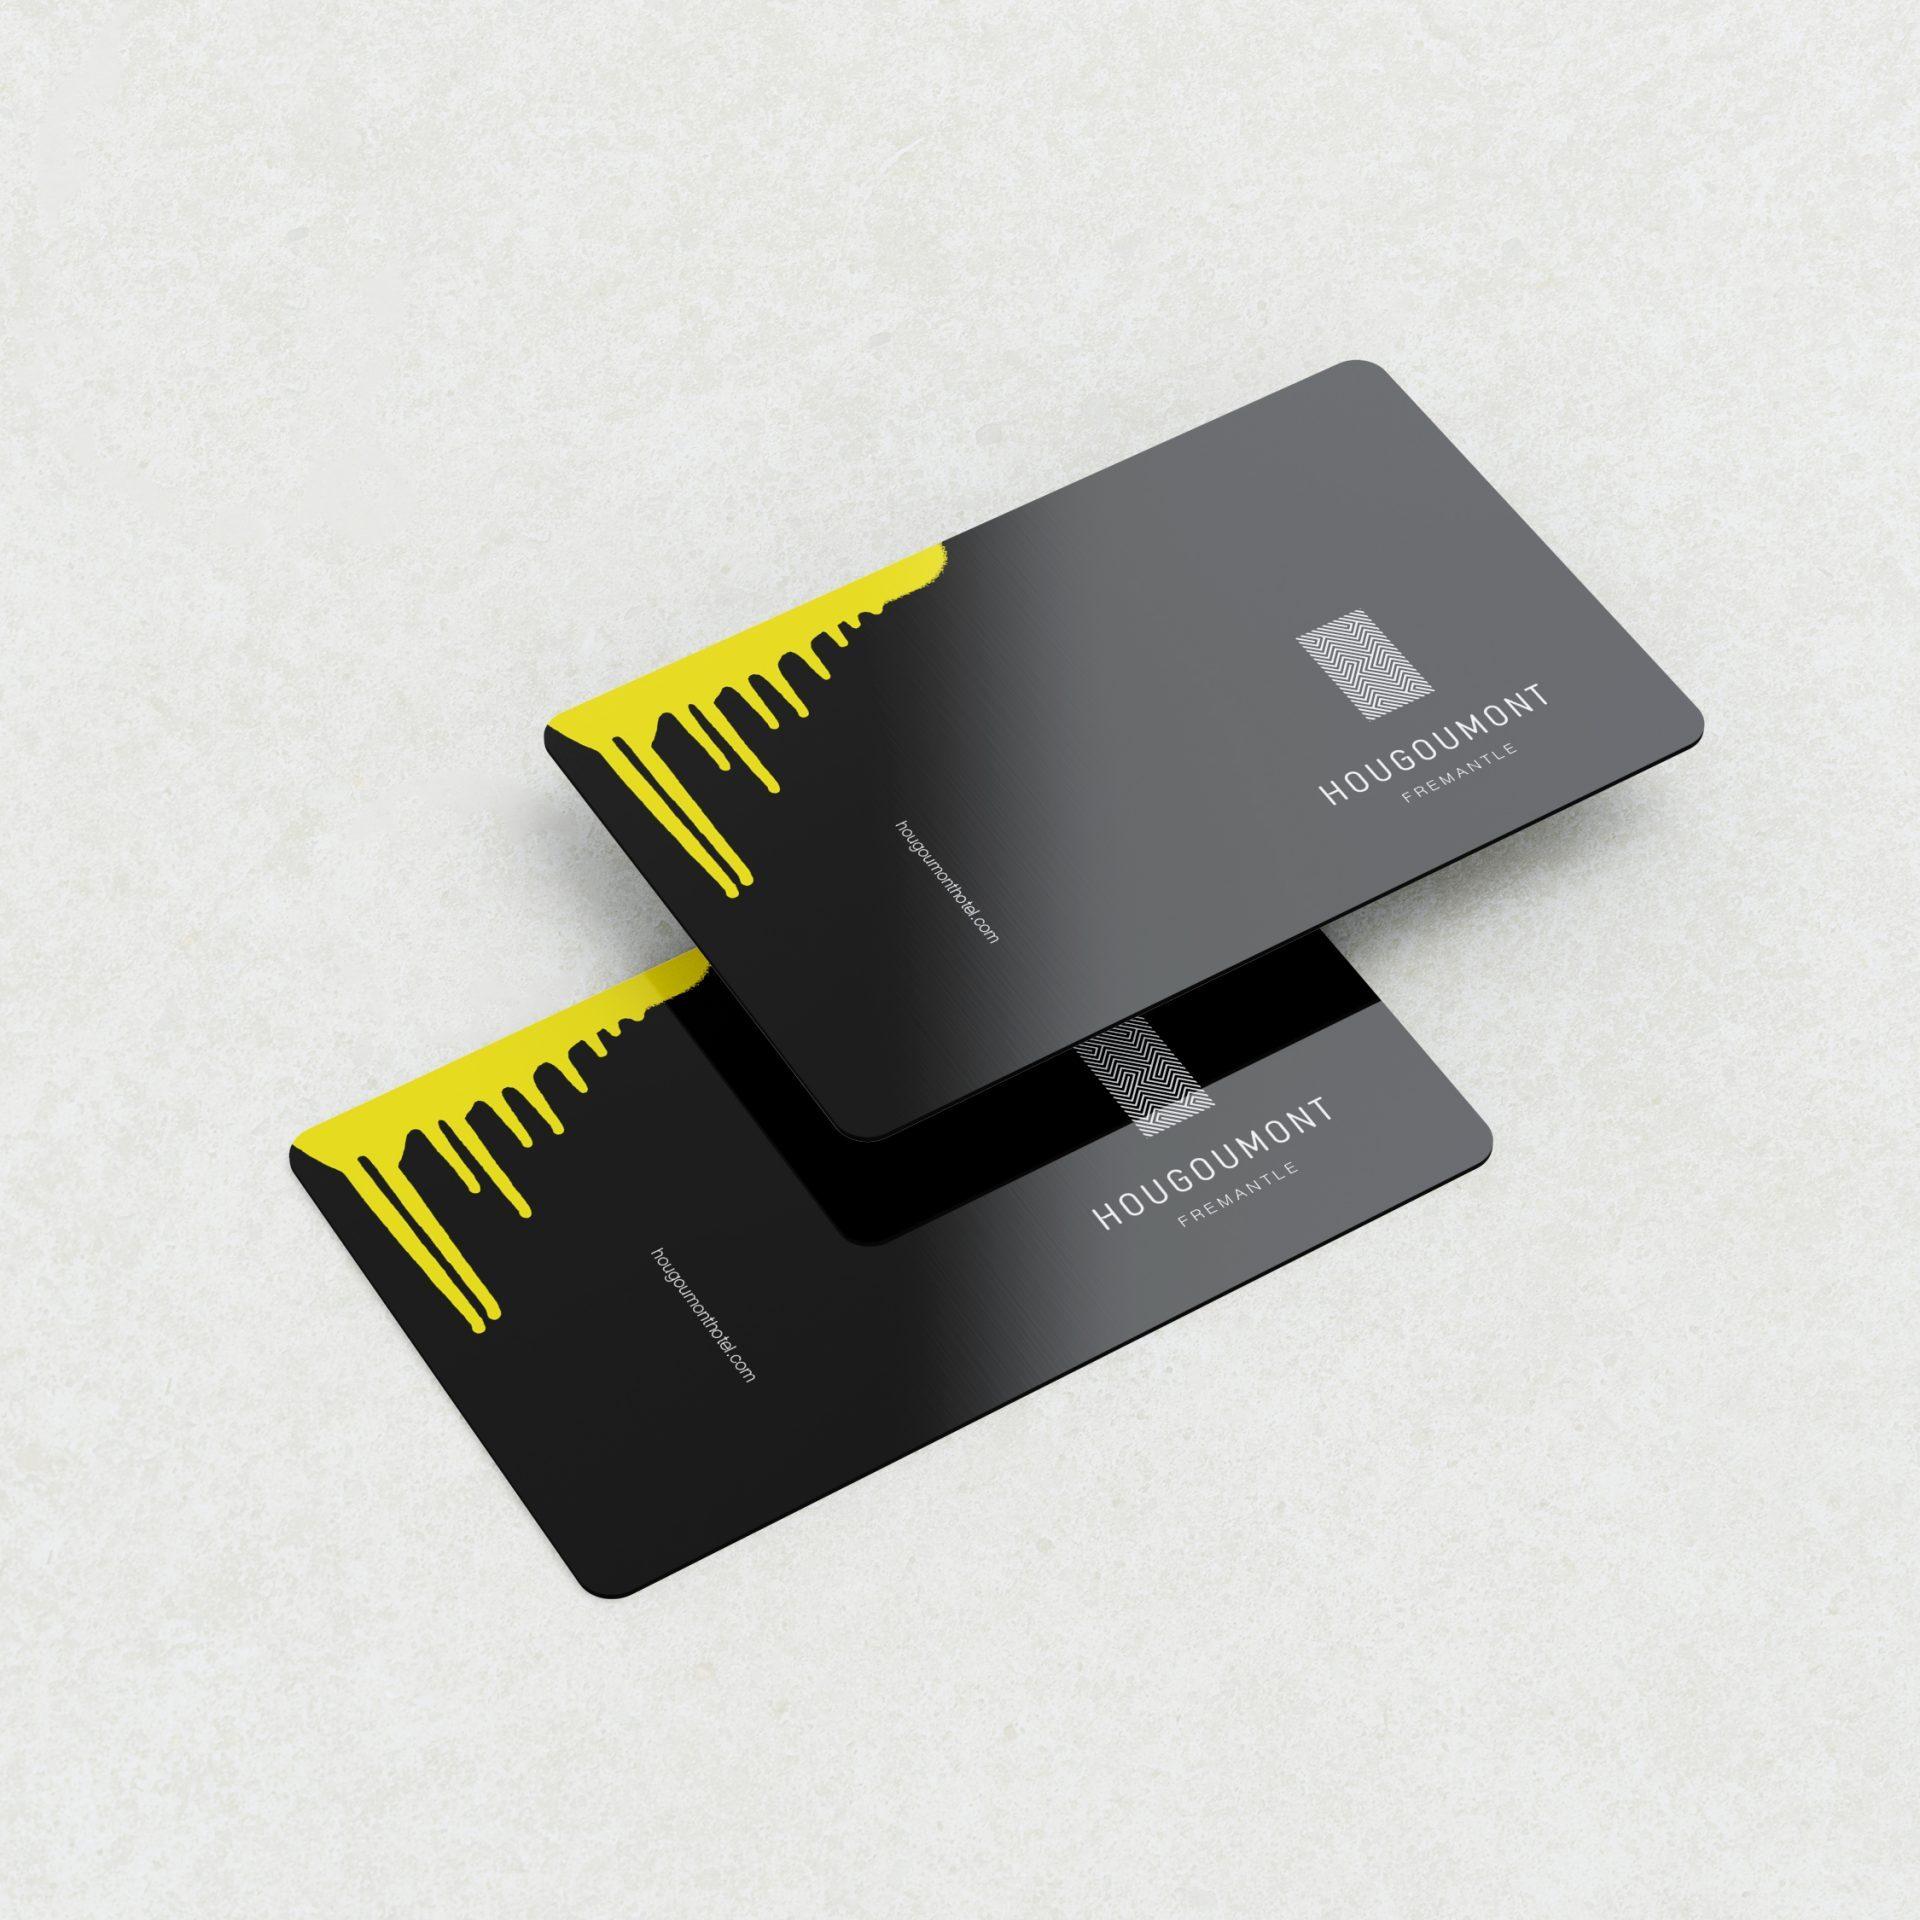 HOUGOMONT_Credit_Card_Mockup_1